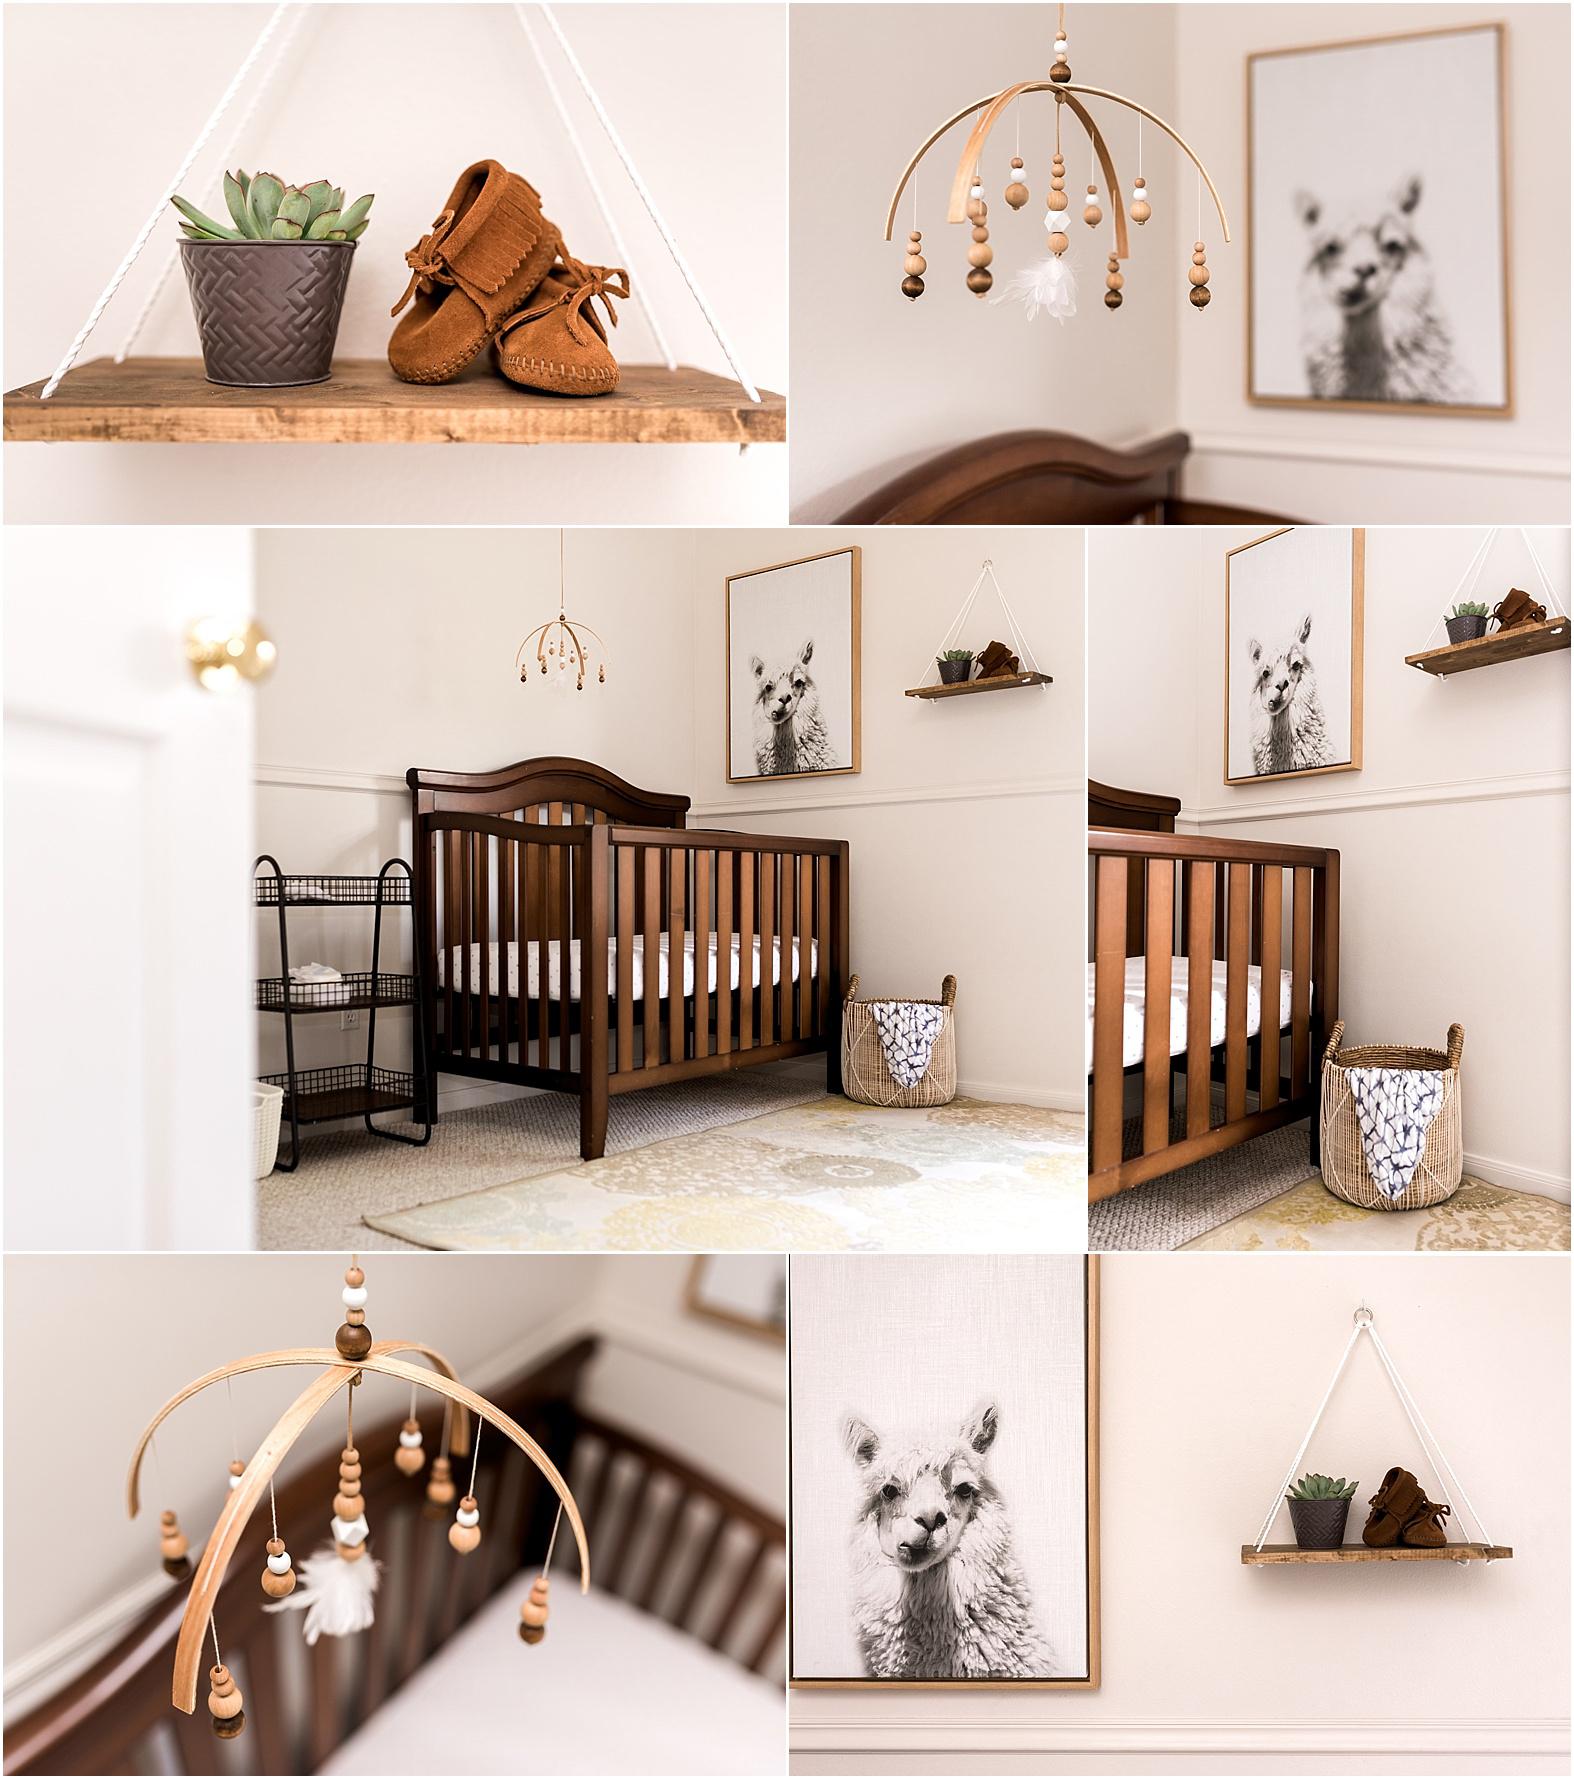 Houston, TX modern white nursery with natural wood mobile and Llama wall art | Dear Marlowe Photography, Houston's Premier Luxury Newborn Lifestyle Photographer.